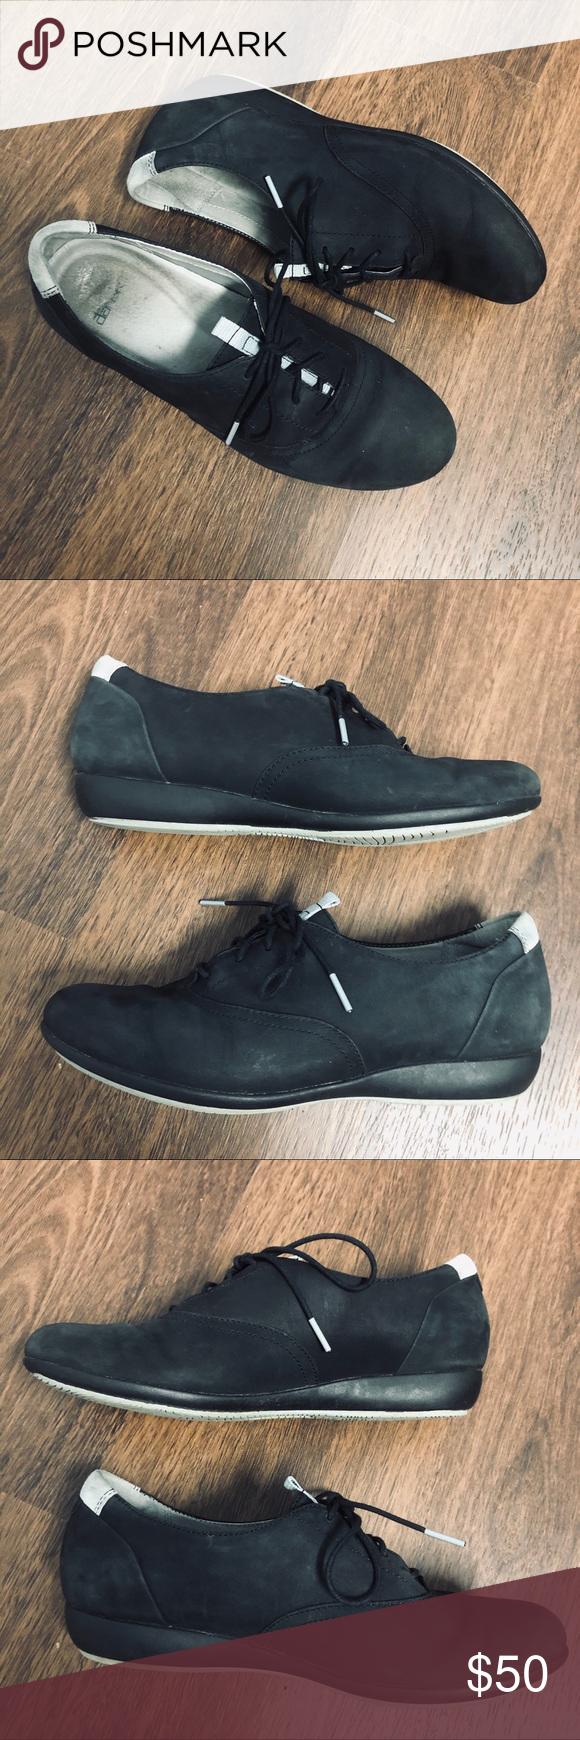 Dansko Nubuk Kimi Wedge Sneaker   Wedge